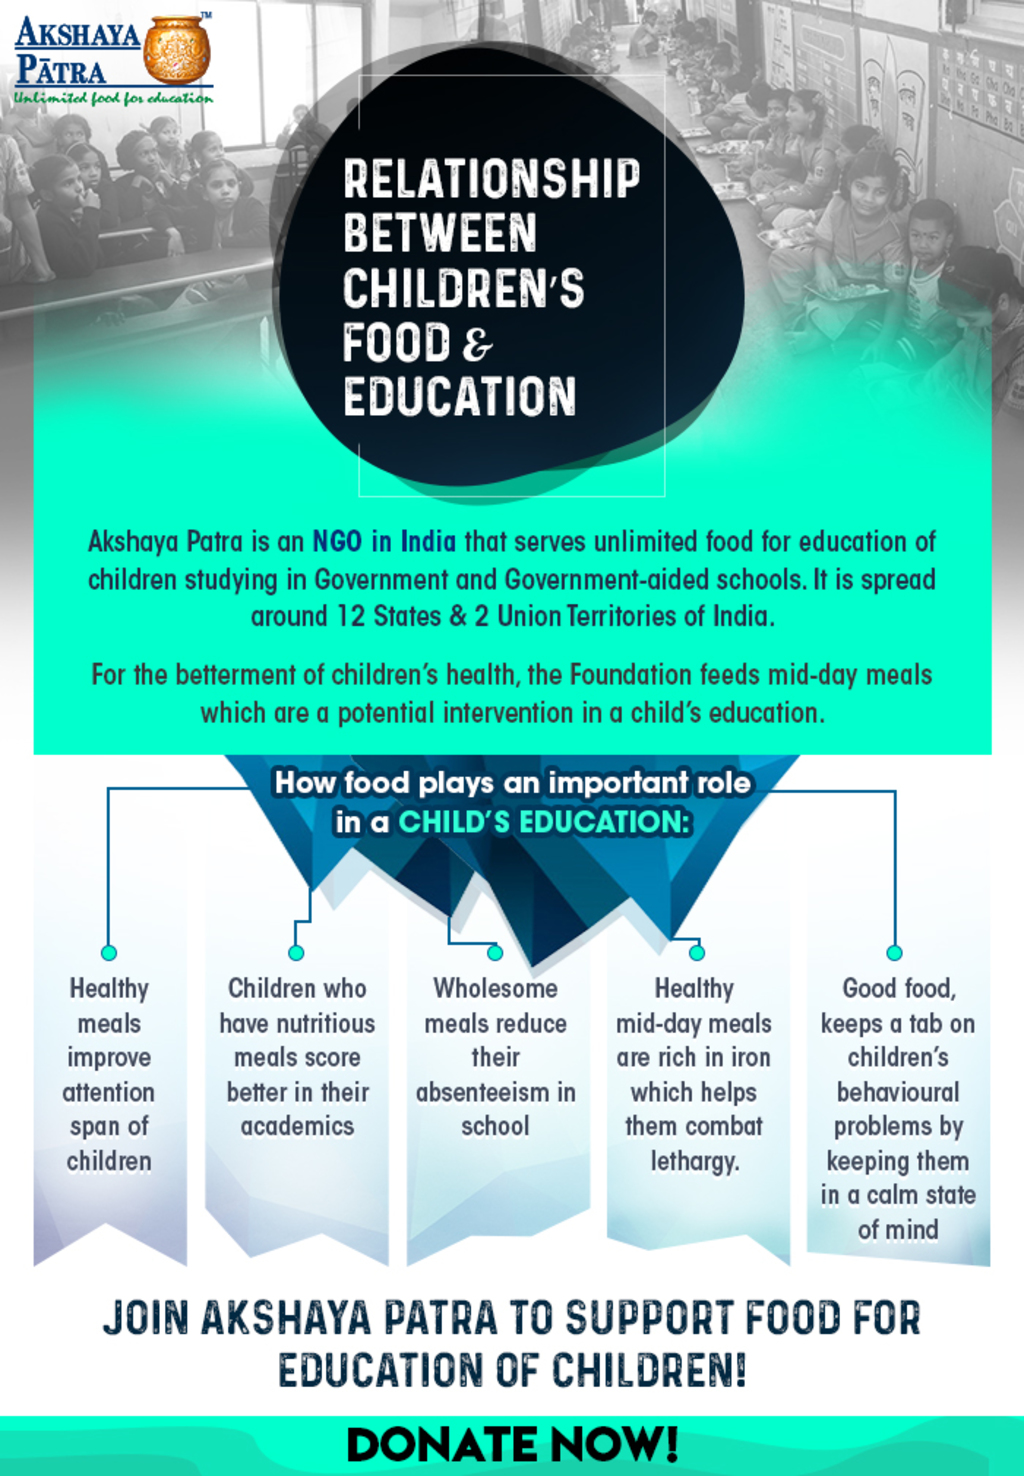 Relationship between children's food & education via Akshaya Patra